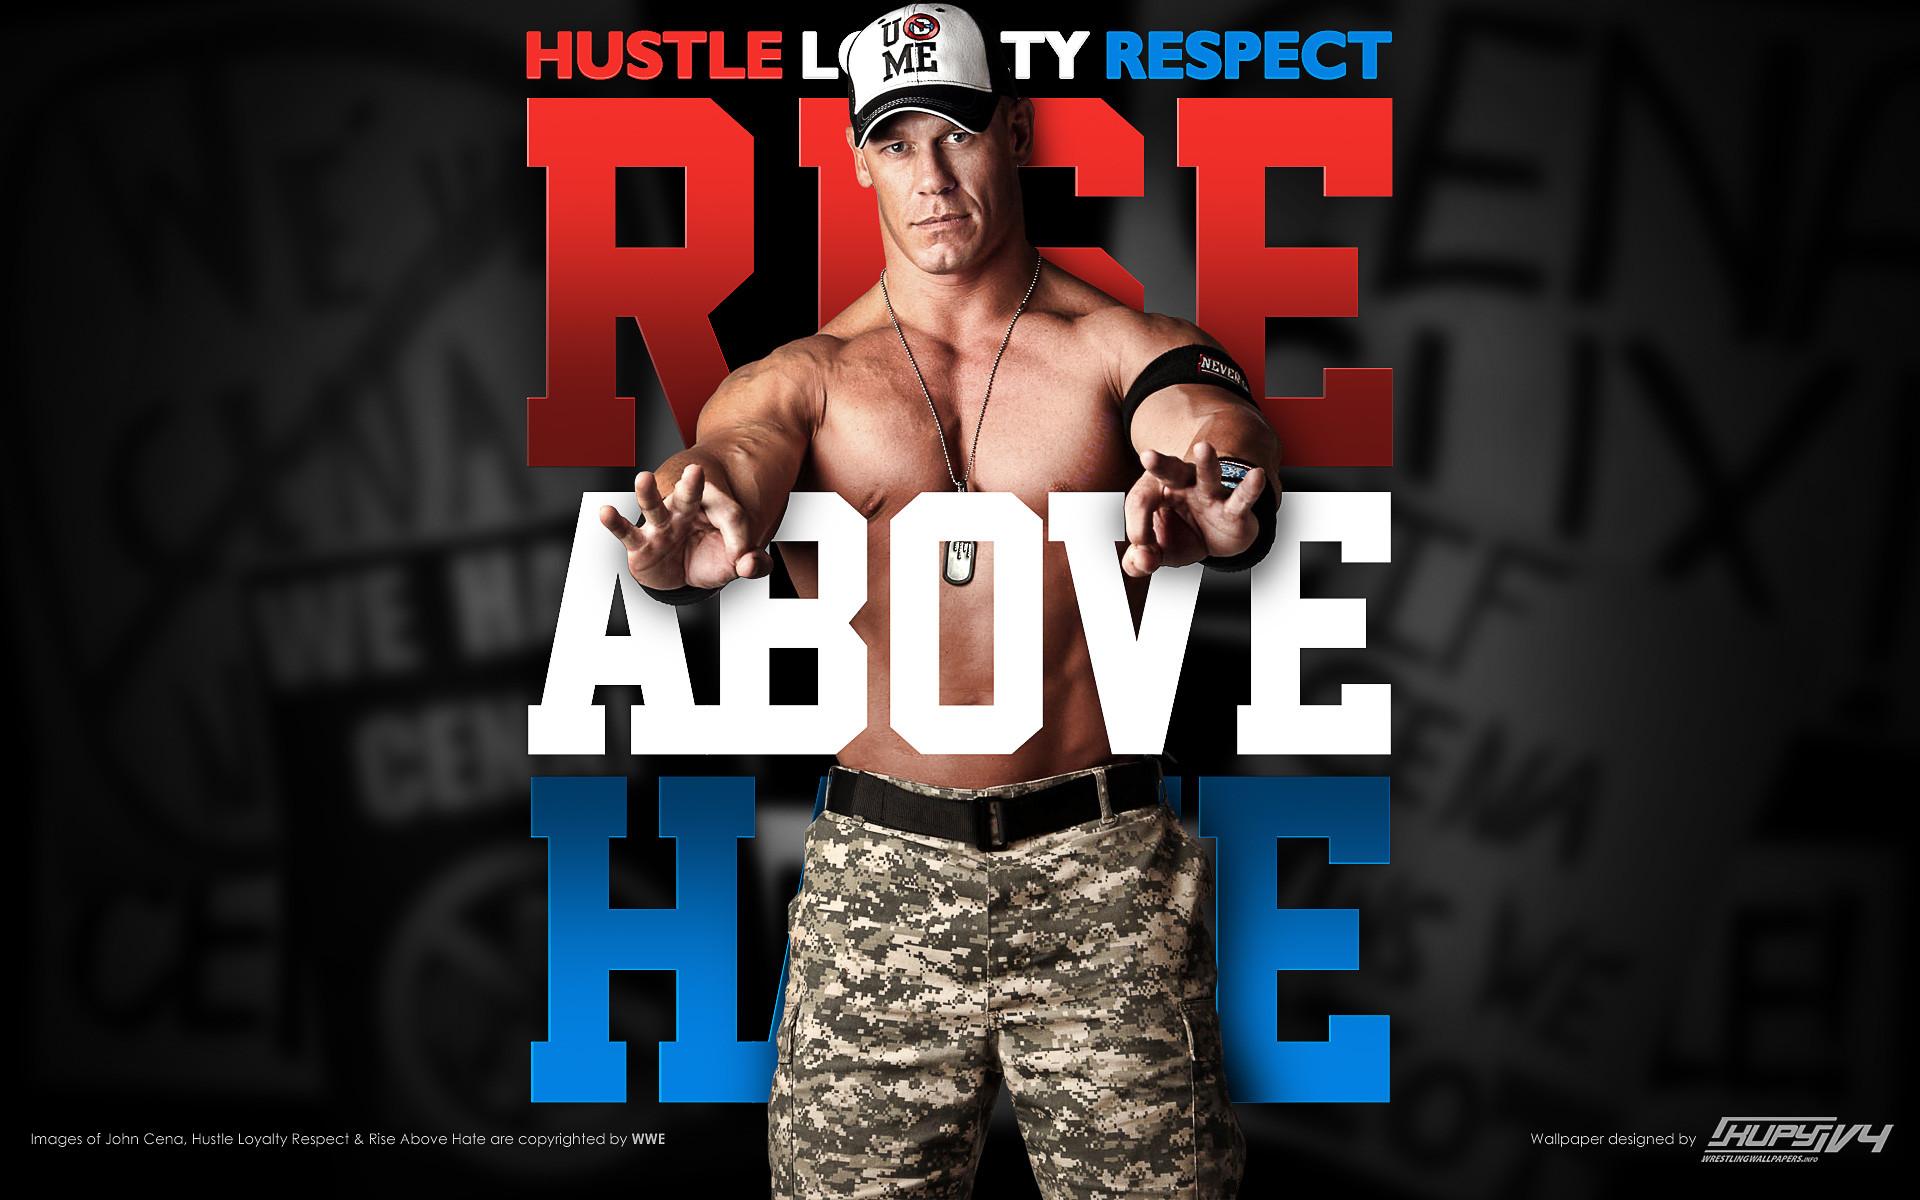 John Cena Wallpaper Rise Above Hate 63 Images